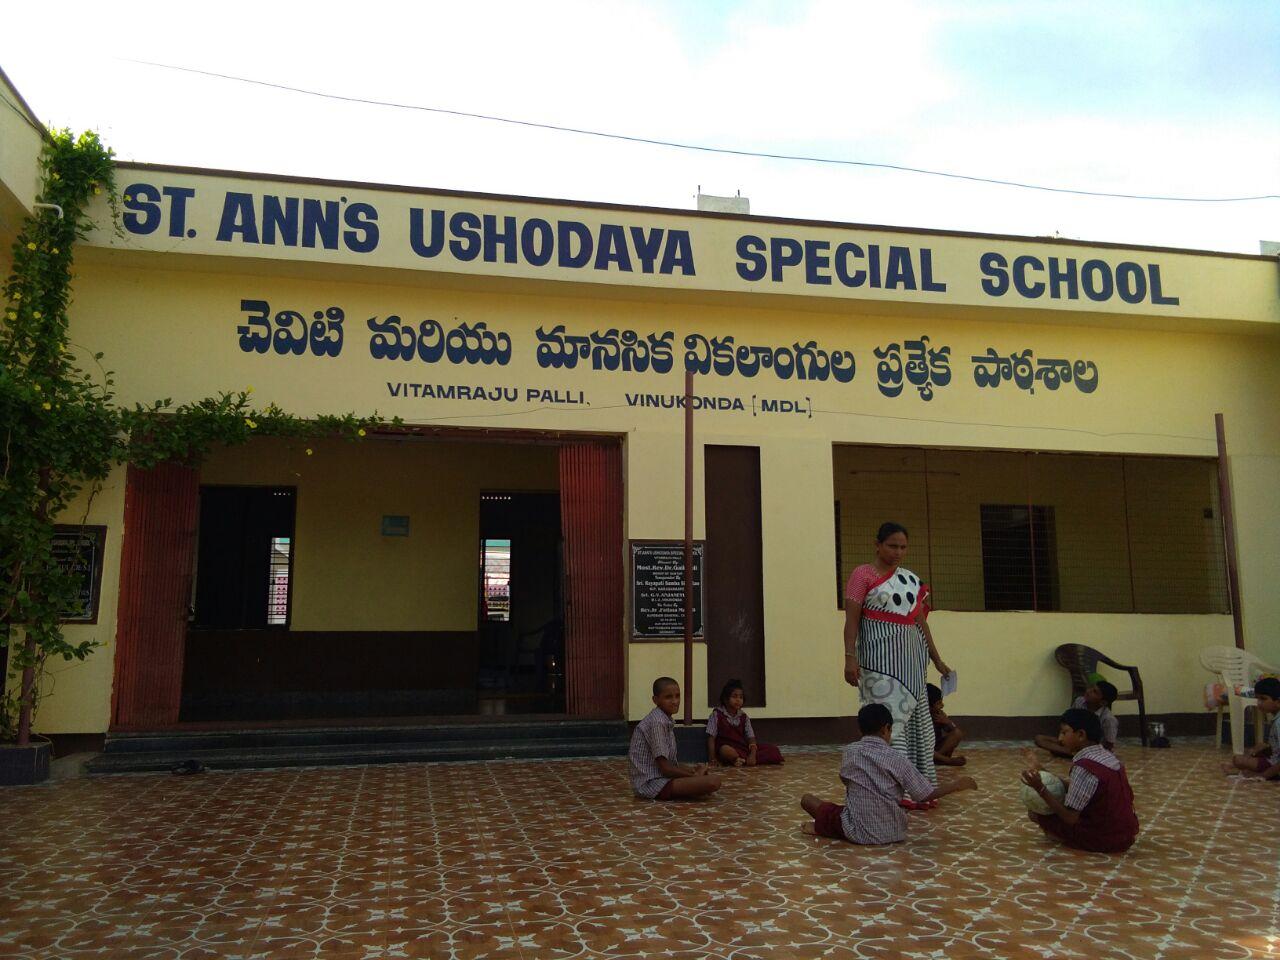 Fans donation to St.Anns Ushodaya Special School Vitamrajupalli,Vinukonda, AP